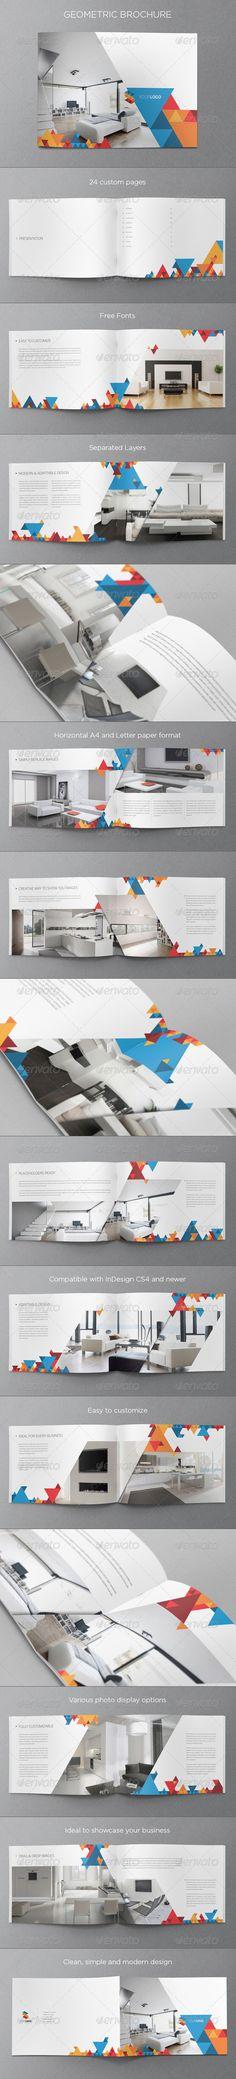 Modern Geometric Brochure - Corporate Brochures